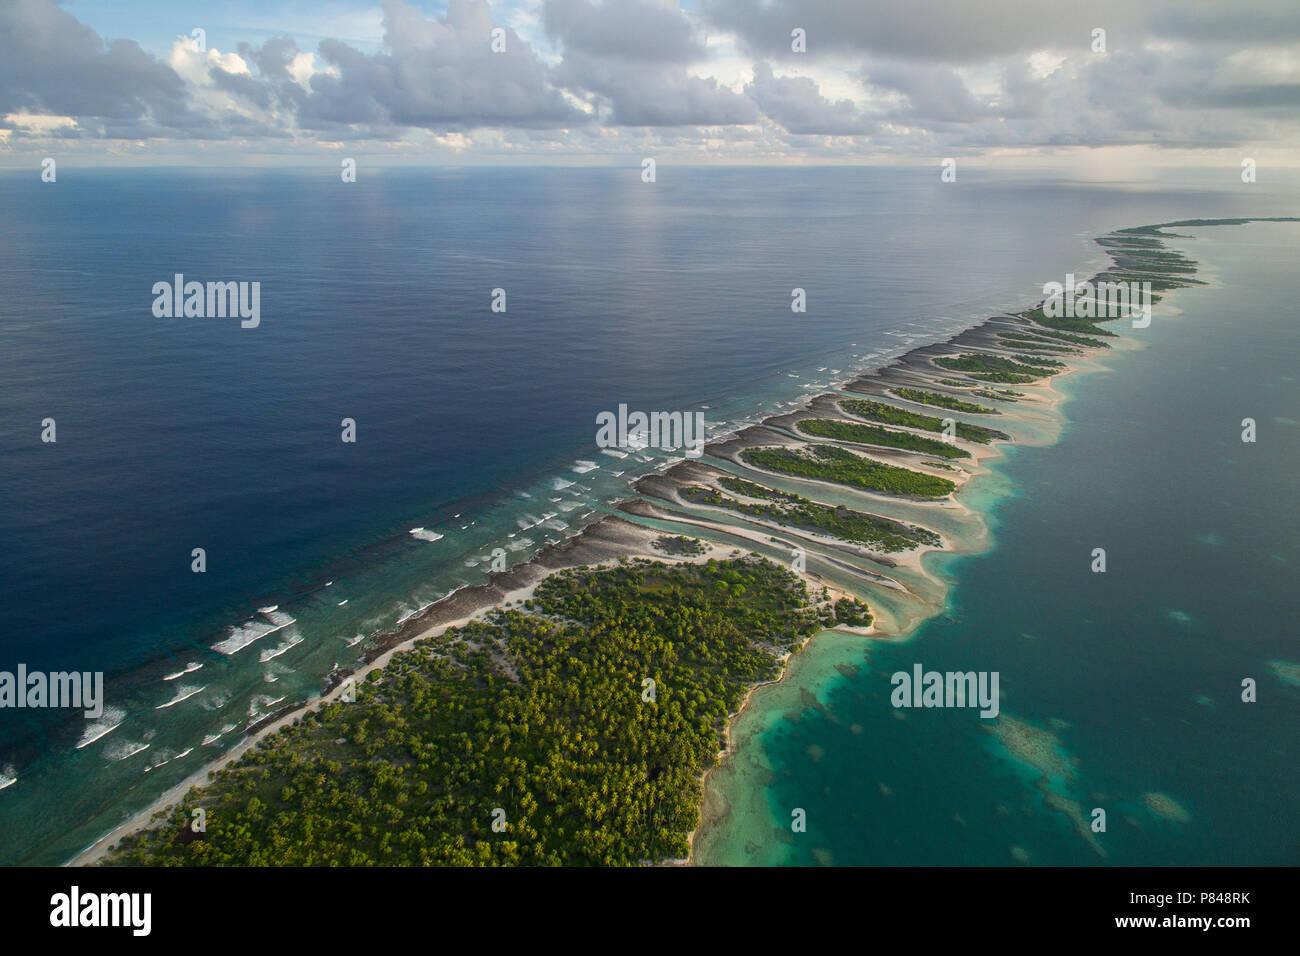 Aerial View of Orona Island, an uninhabited island in the Phoenix Islands, Kiribati. - Stock Image